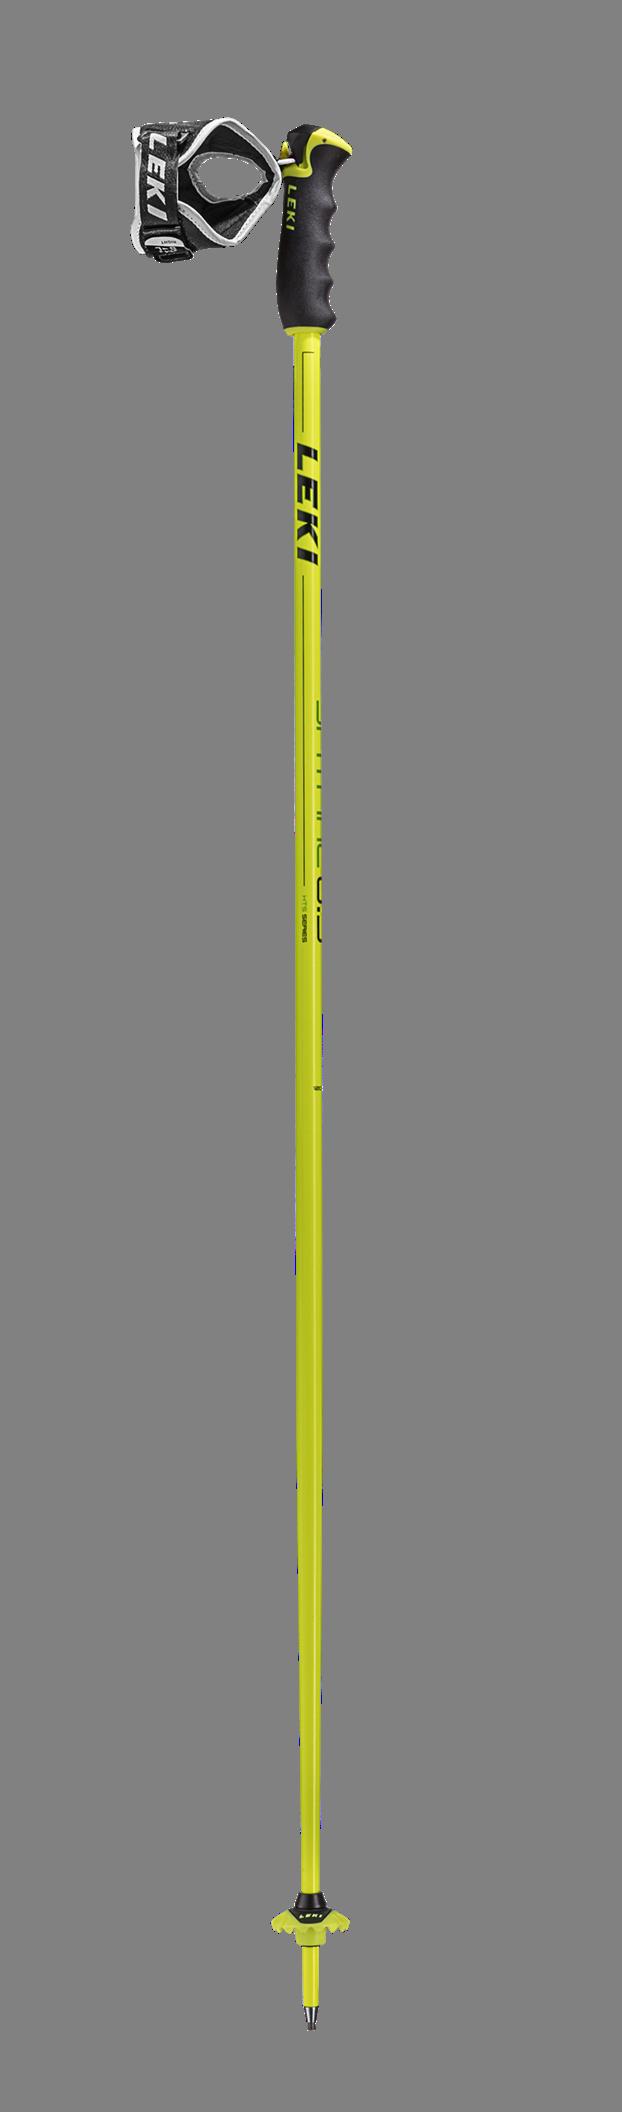 Leki Spitfire S Ski Pole - Yellow